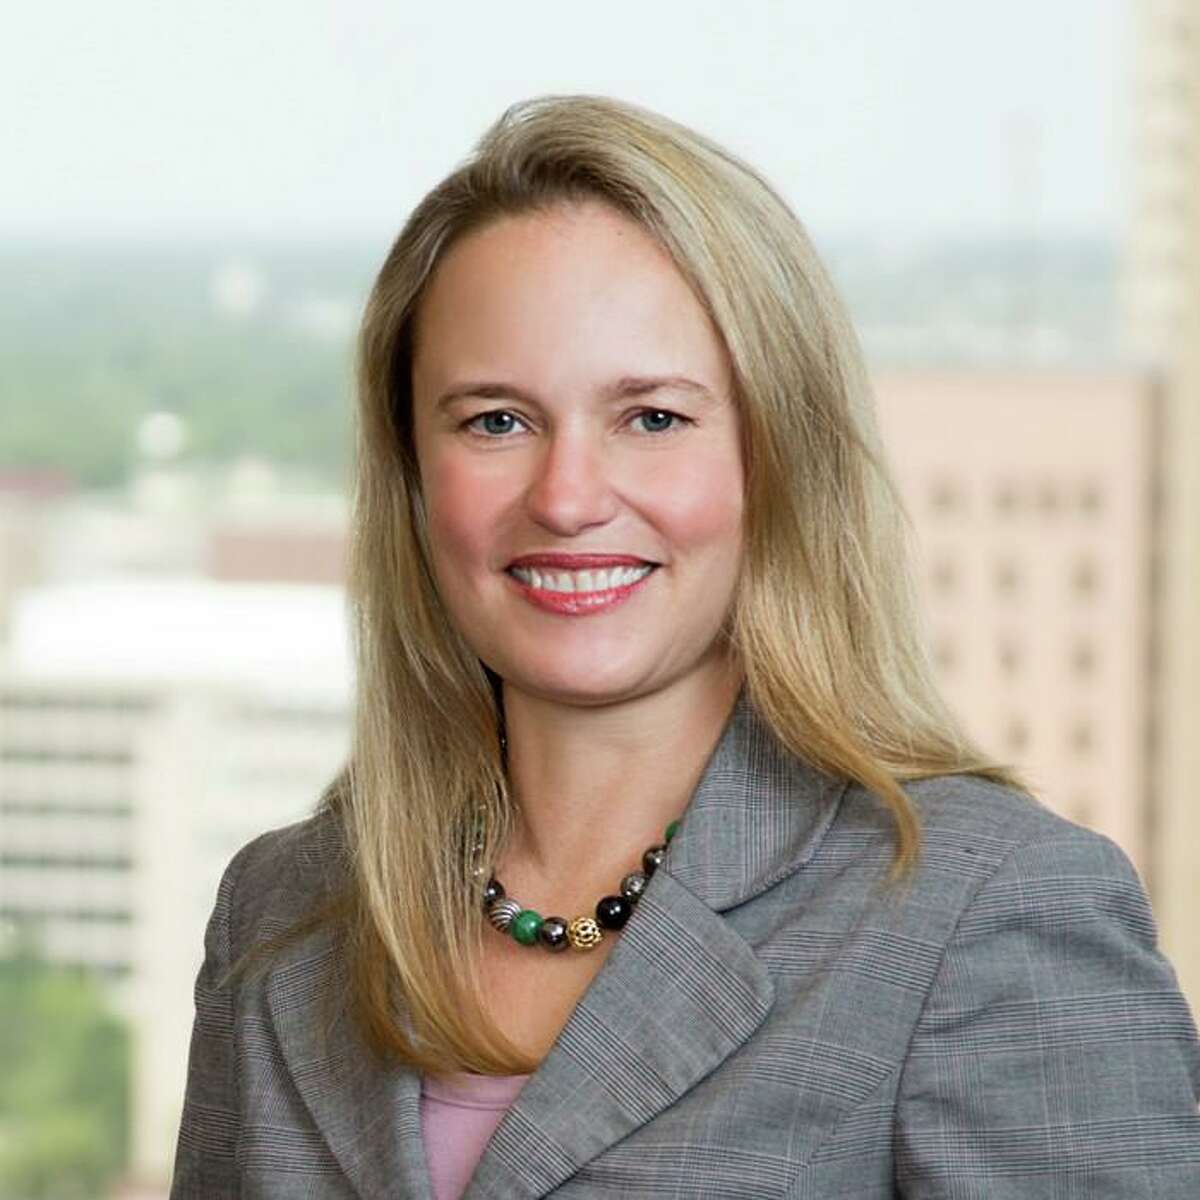 Elizabeth Freeman, a corporate bankruptcy law partner at Jackson Walker in Houston